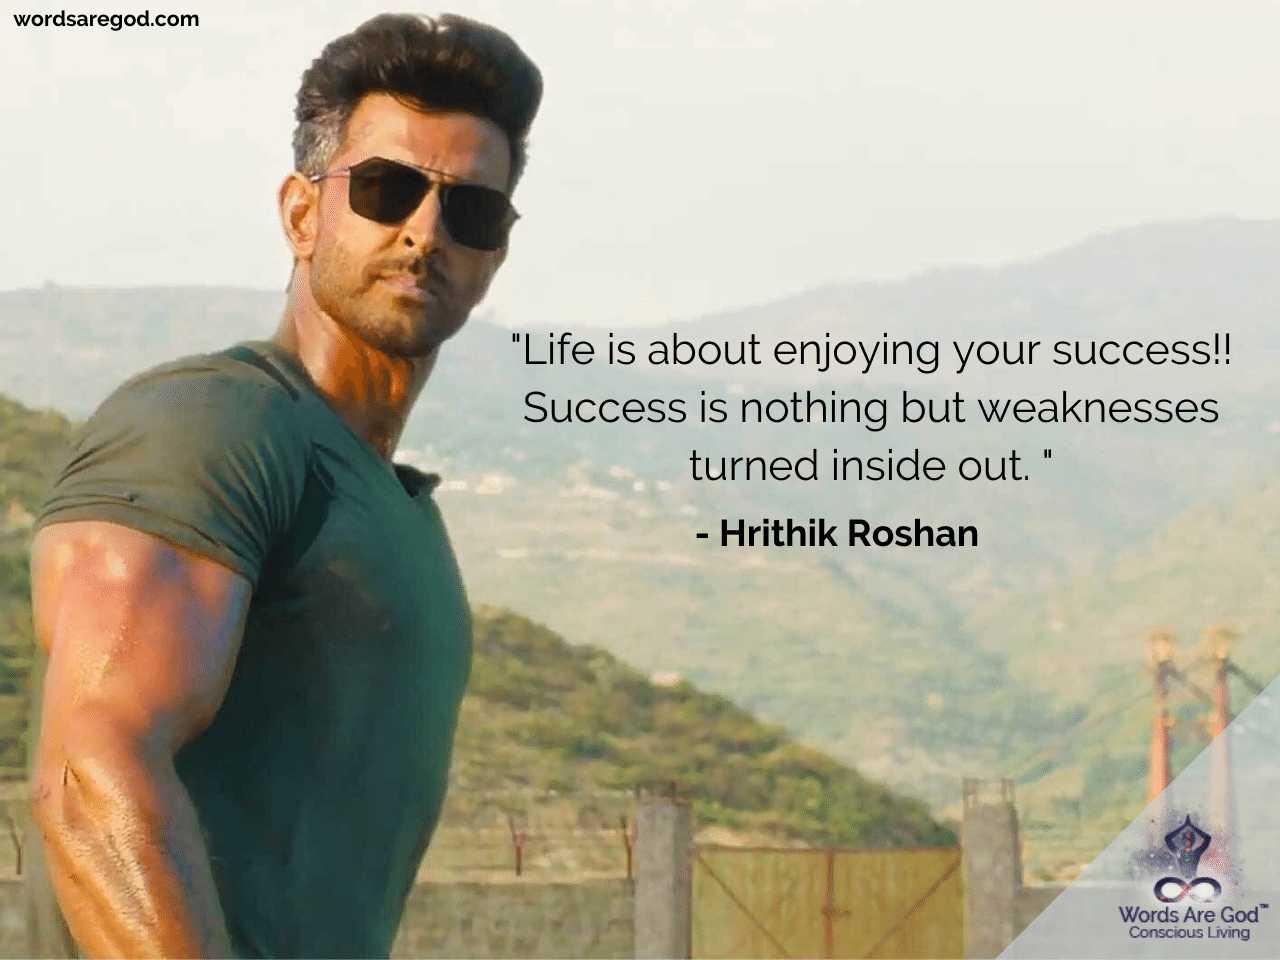 Hrithik Roshan Best Quotes by Hrithik Roshan